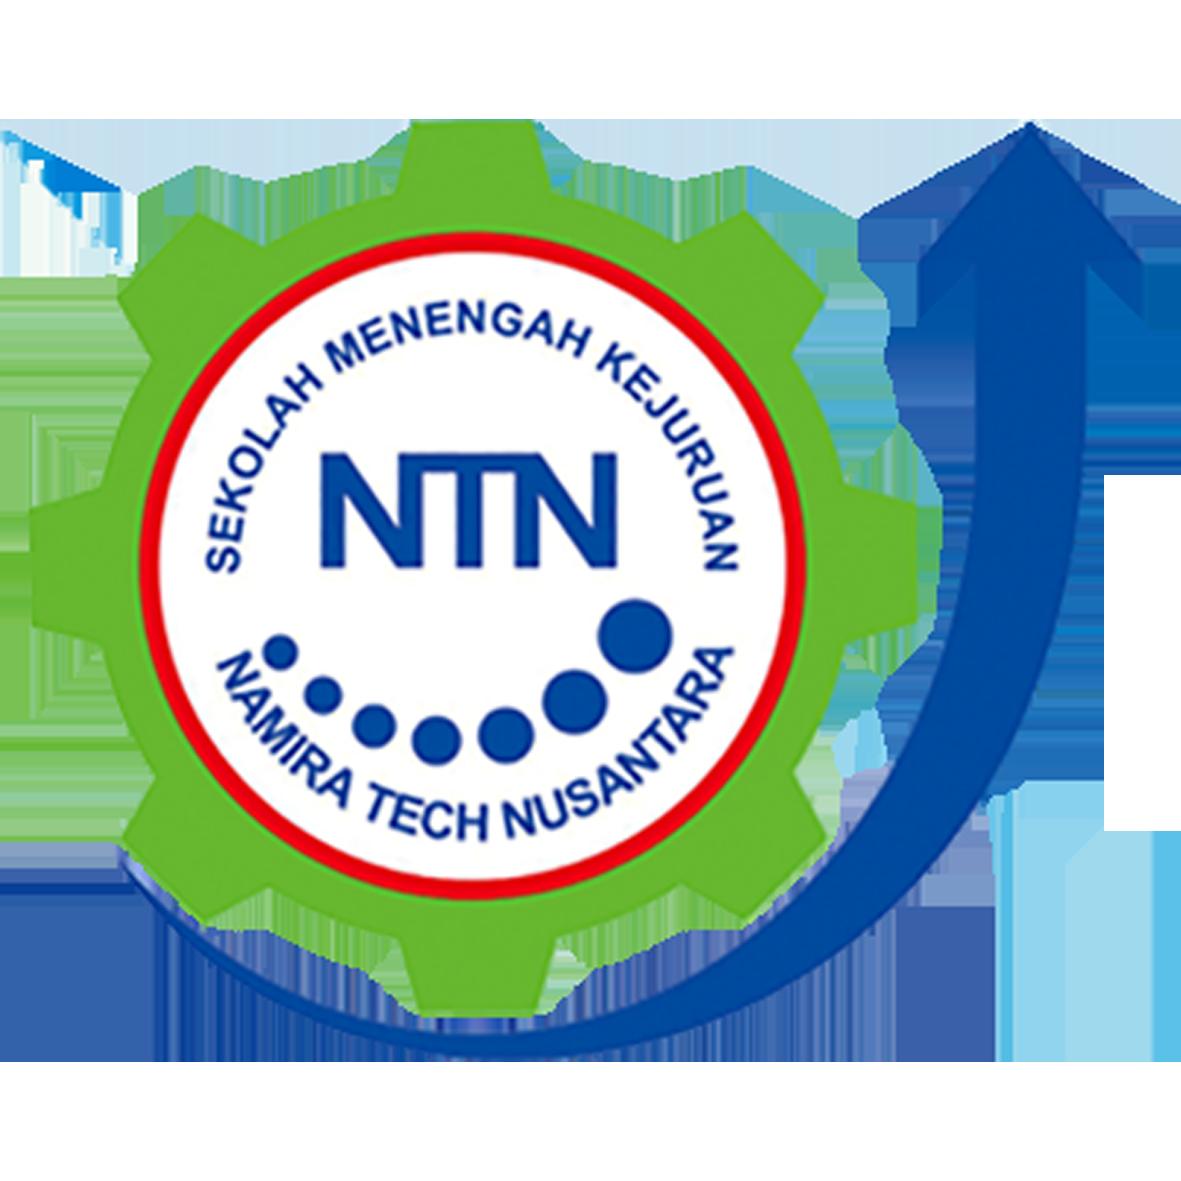 SMK Namira Tech Nusantara